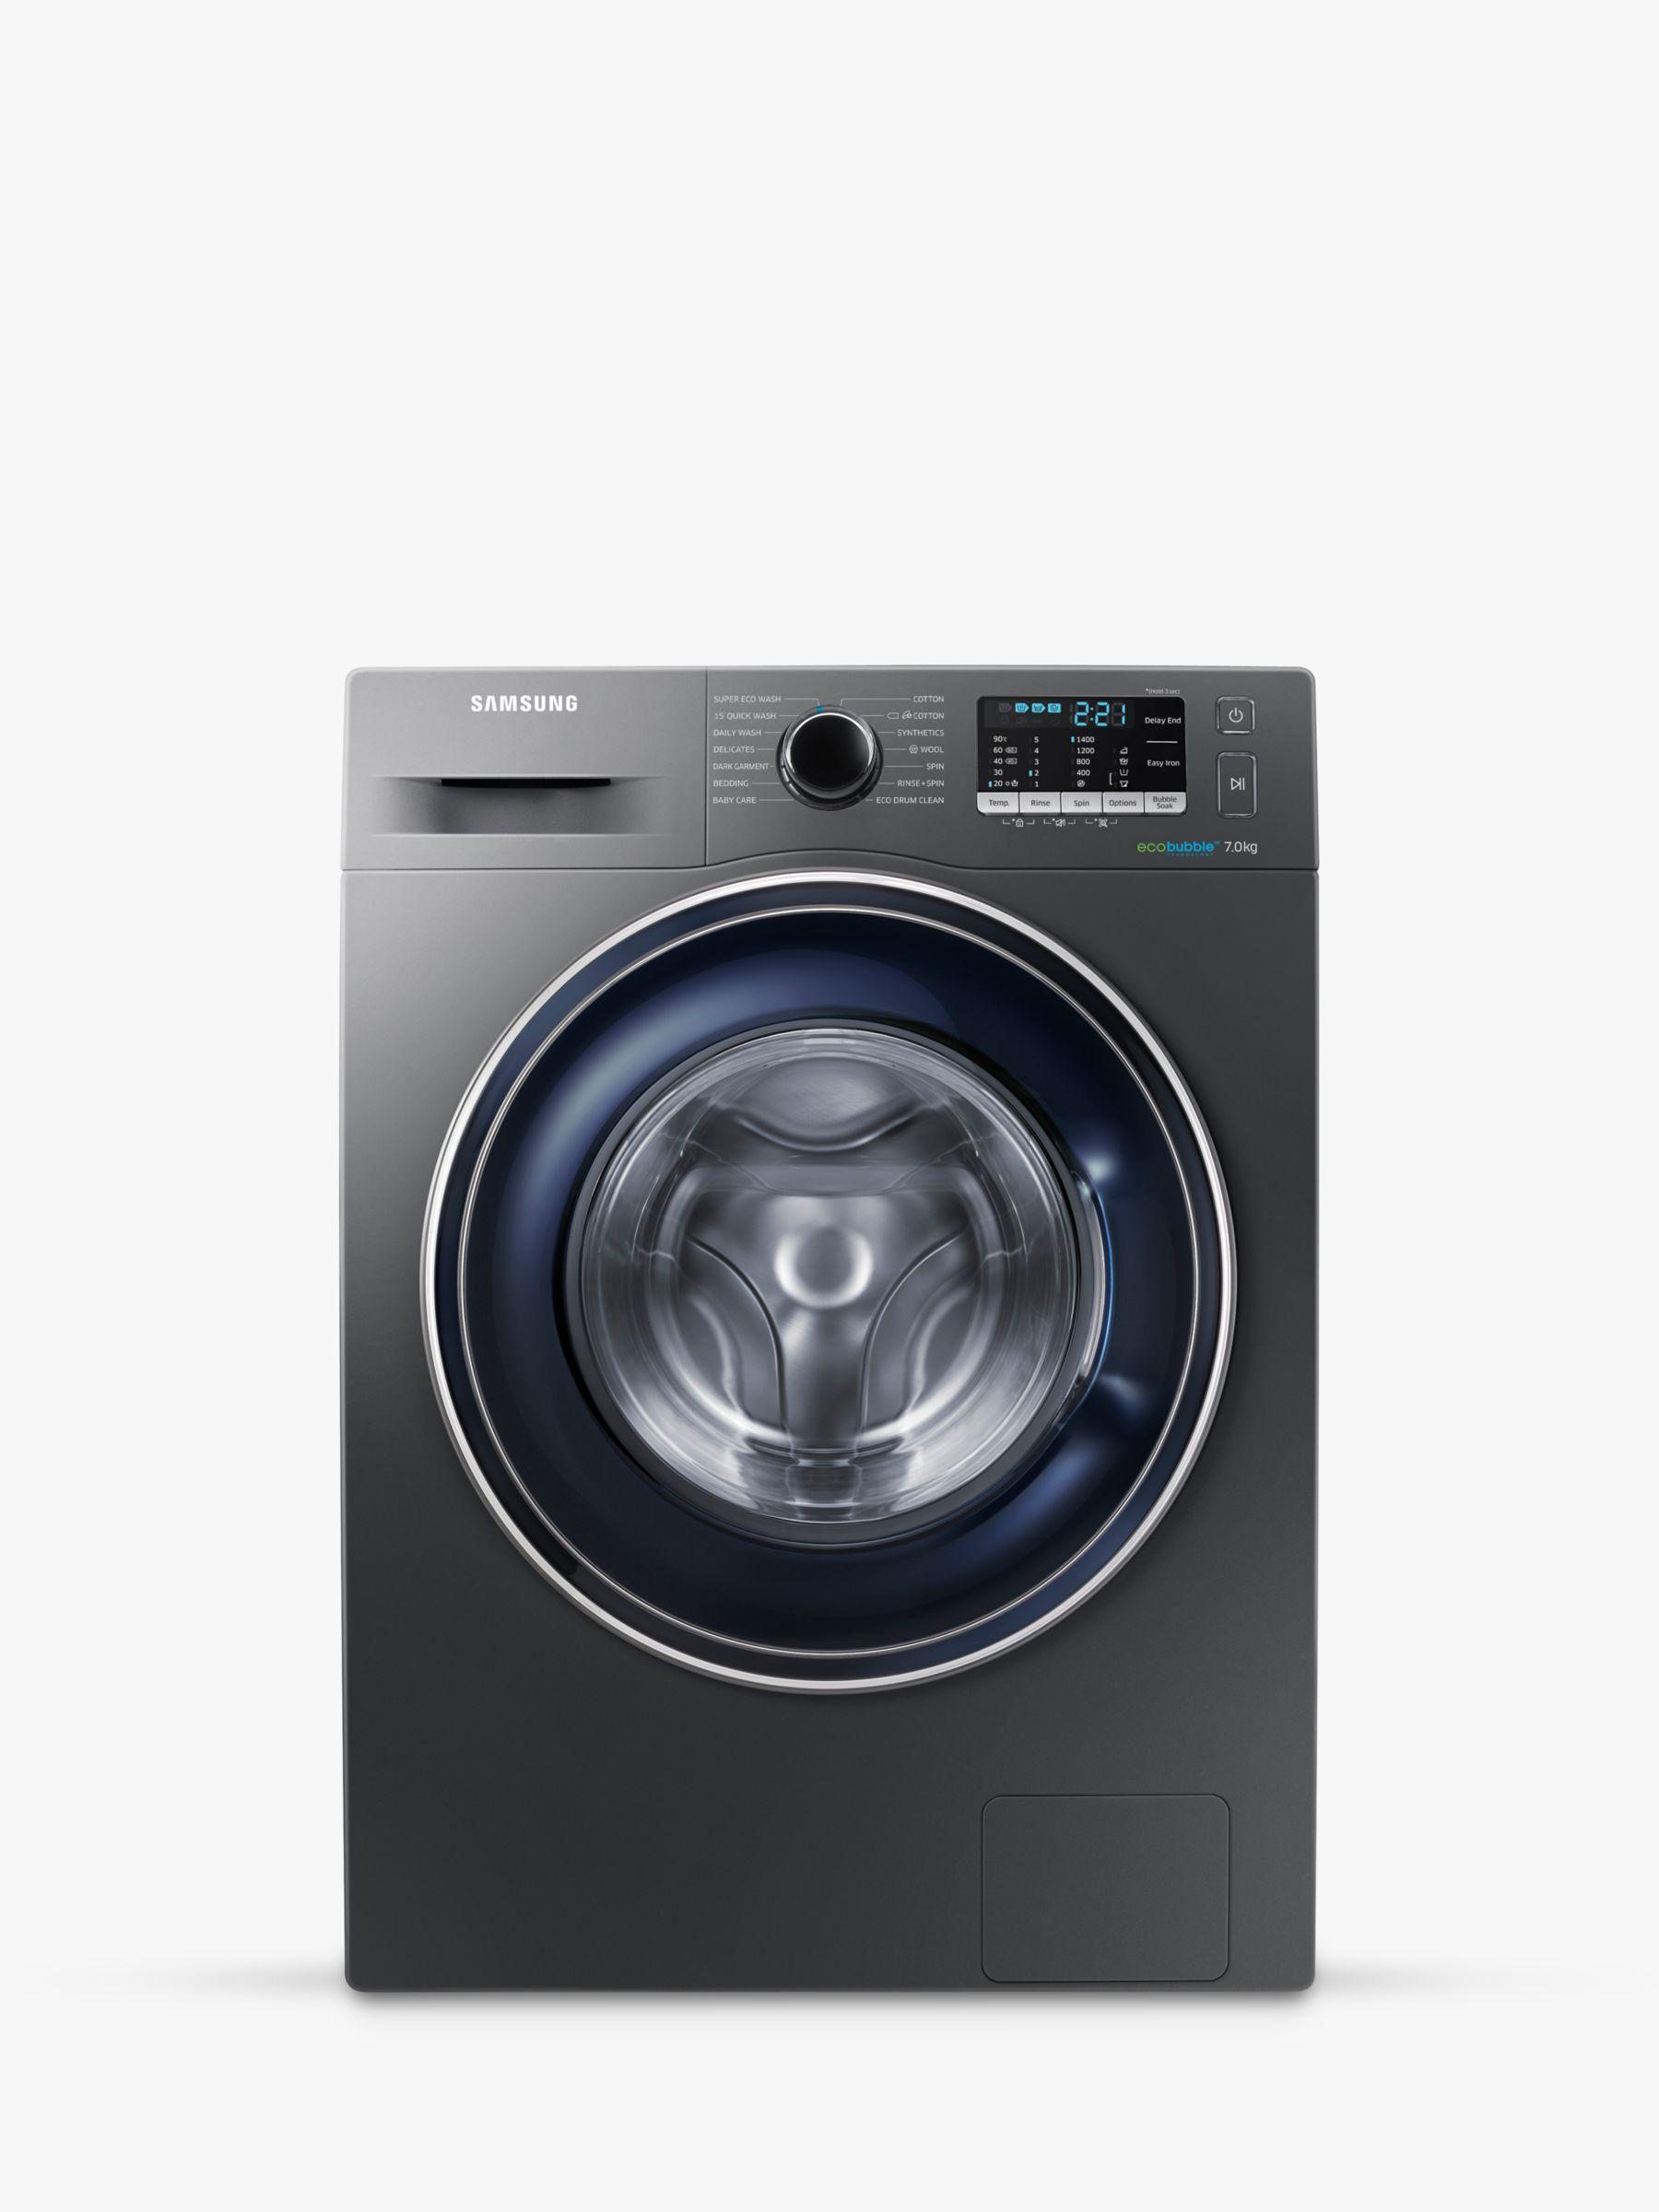 Samsung Samsung WW70J5555FX/EU ecobubble™ Freestanding Washing Machine, 7kg Load, A+++ Energy Rating, 1400rpm Spin, Graphite